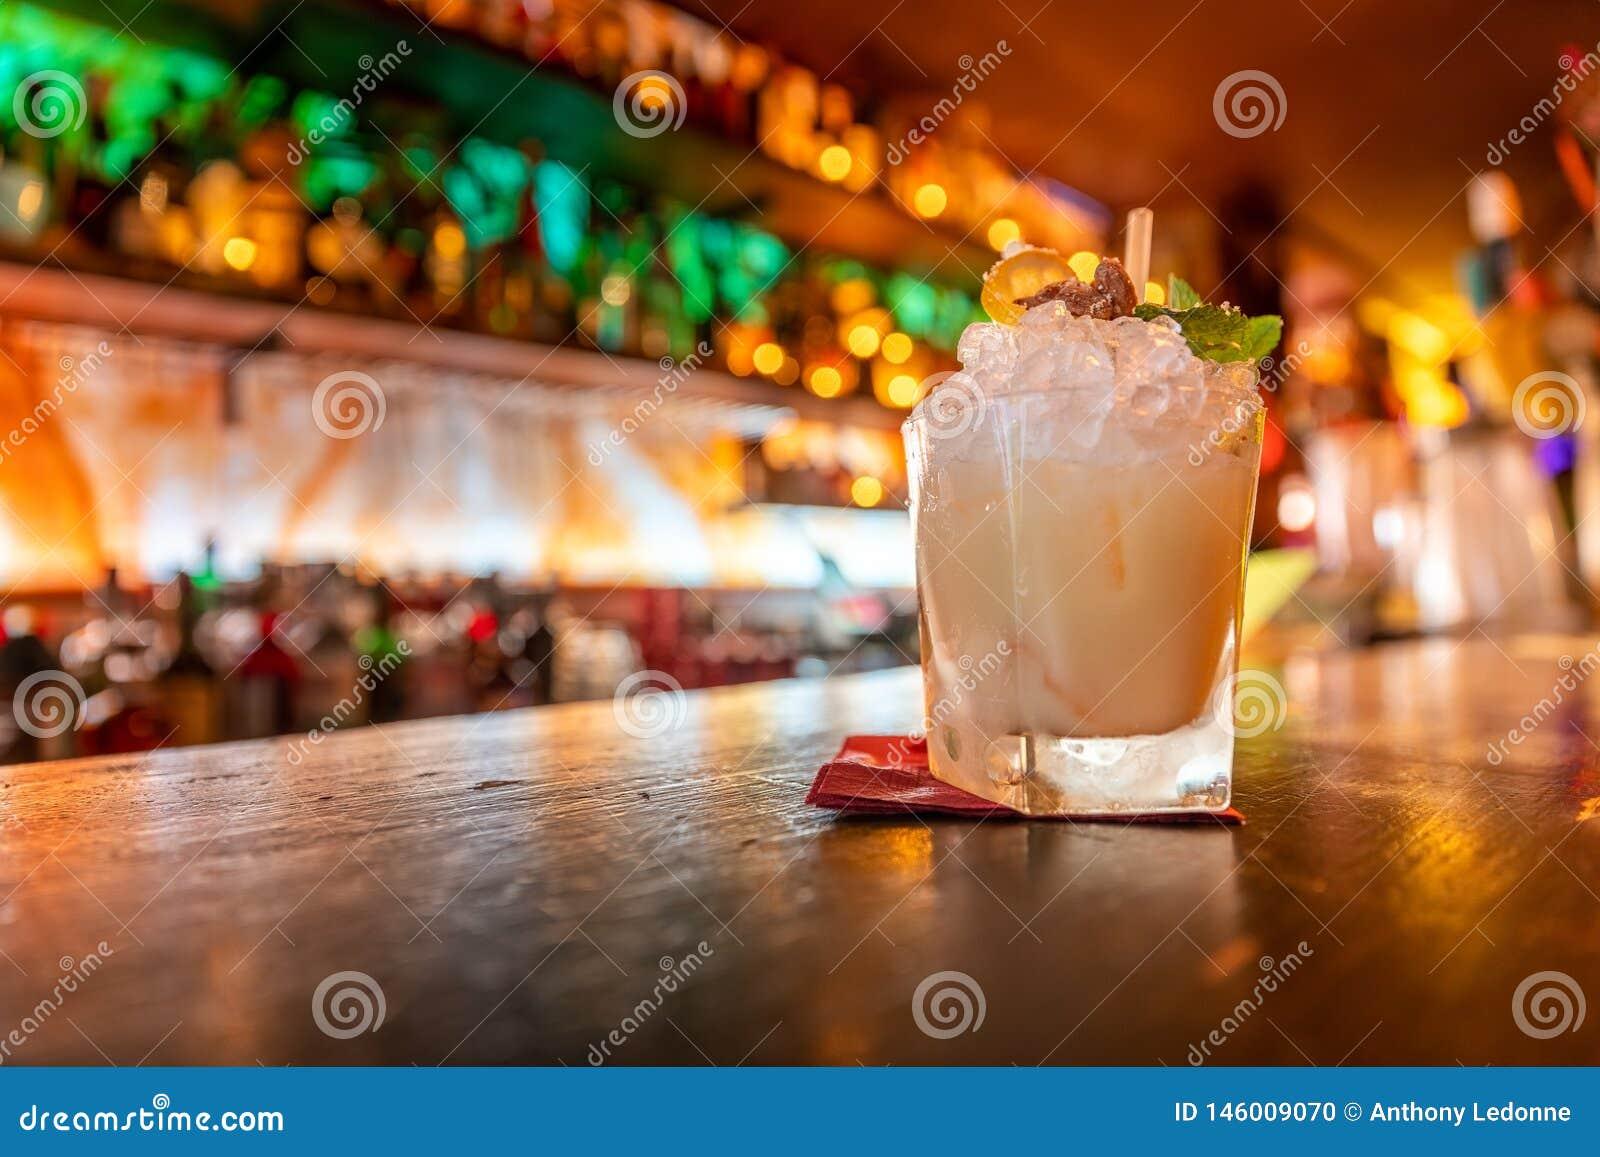 A Cocktail in a Tiki Bar in Paris, France